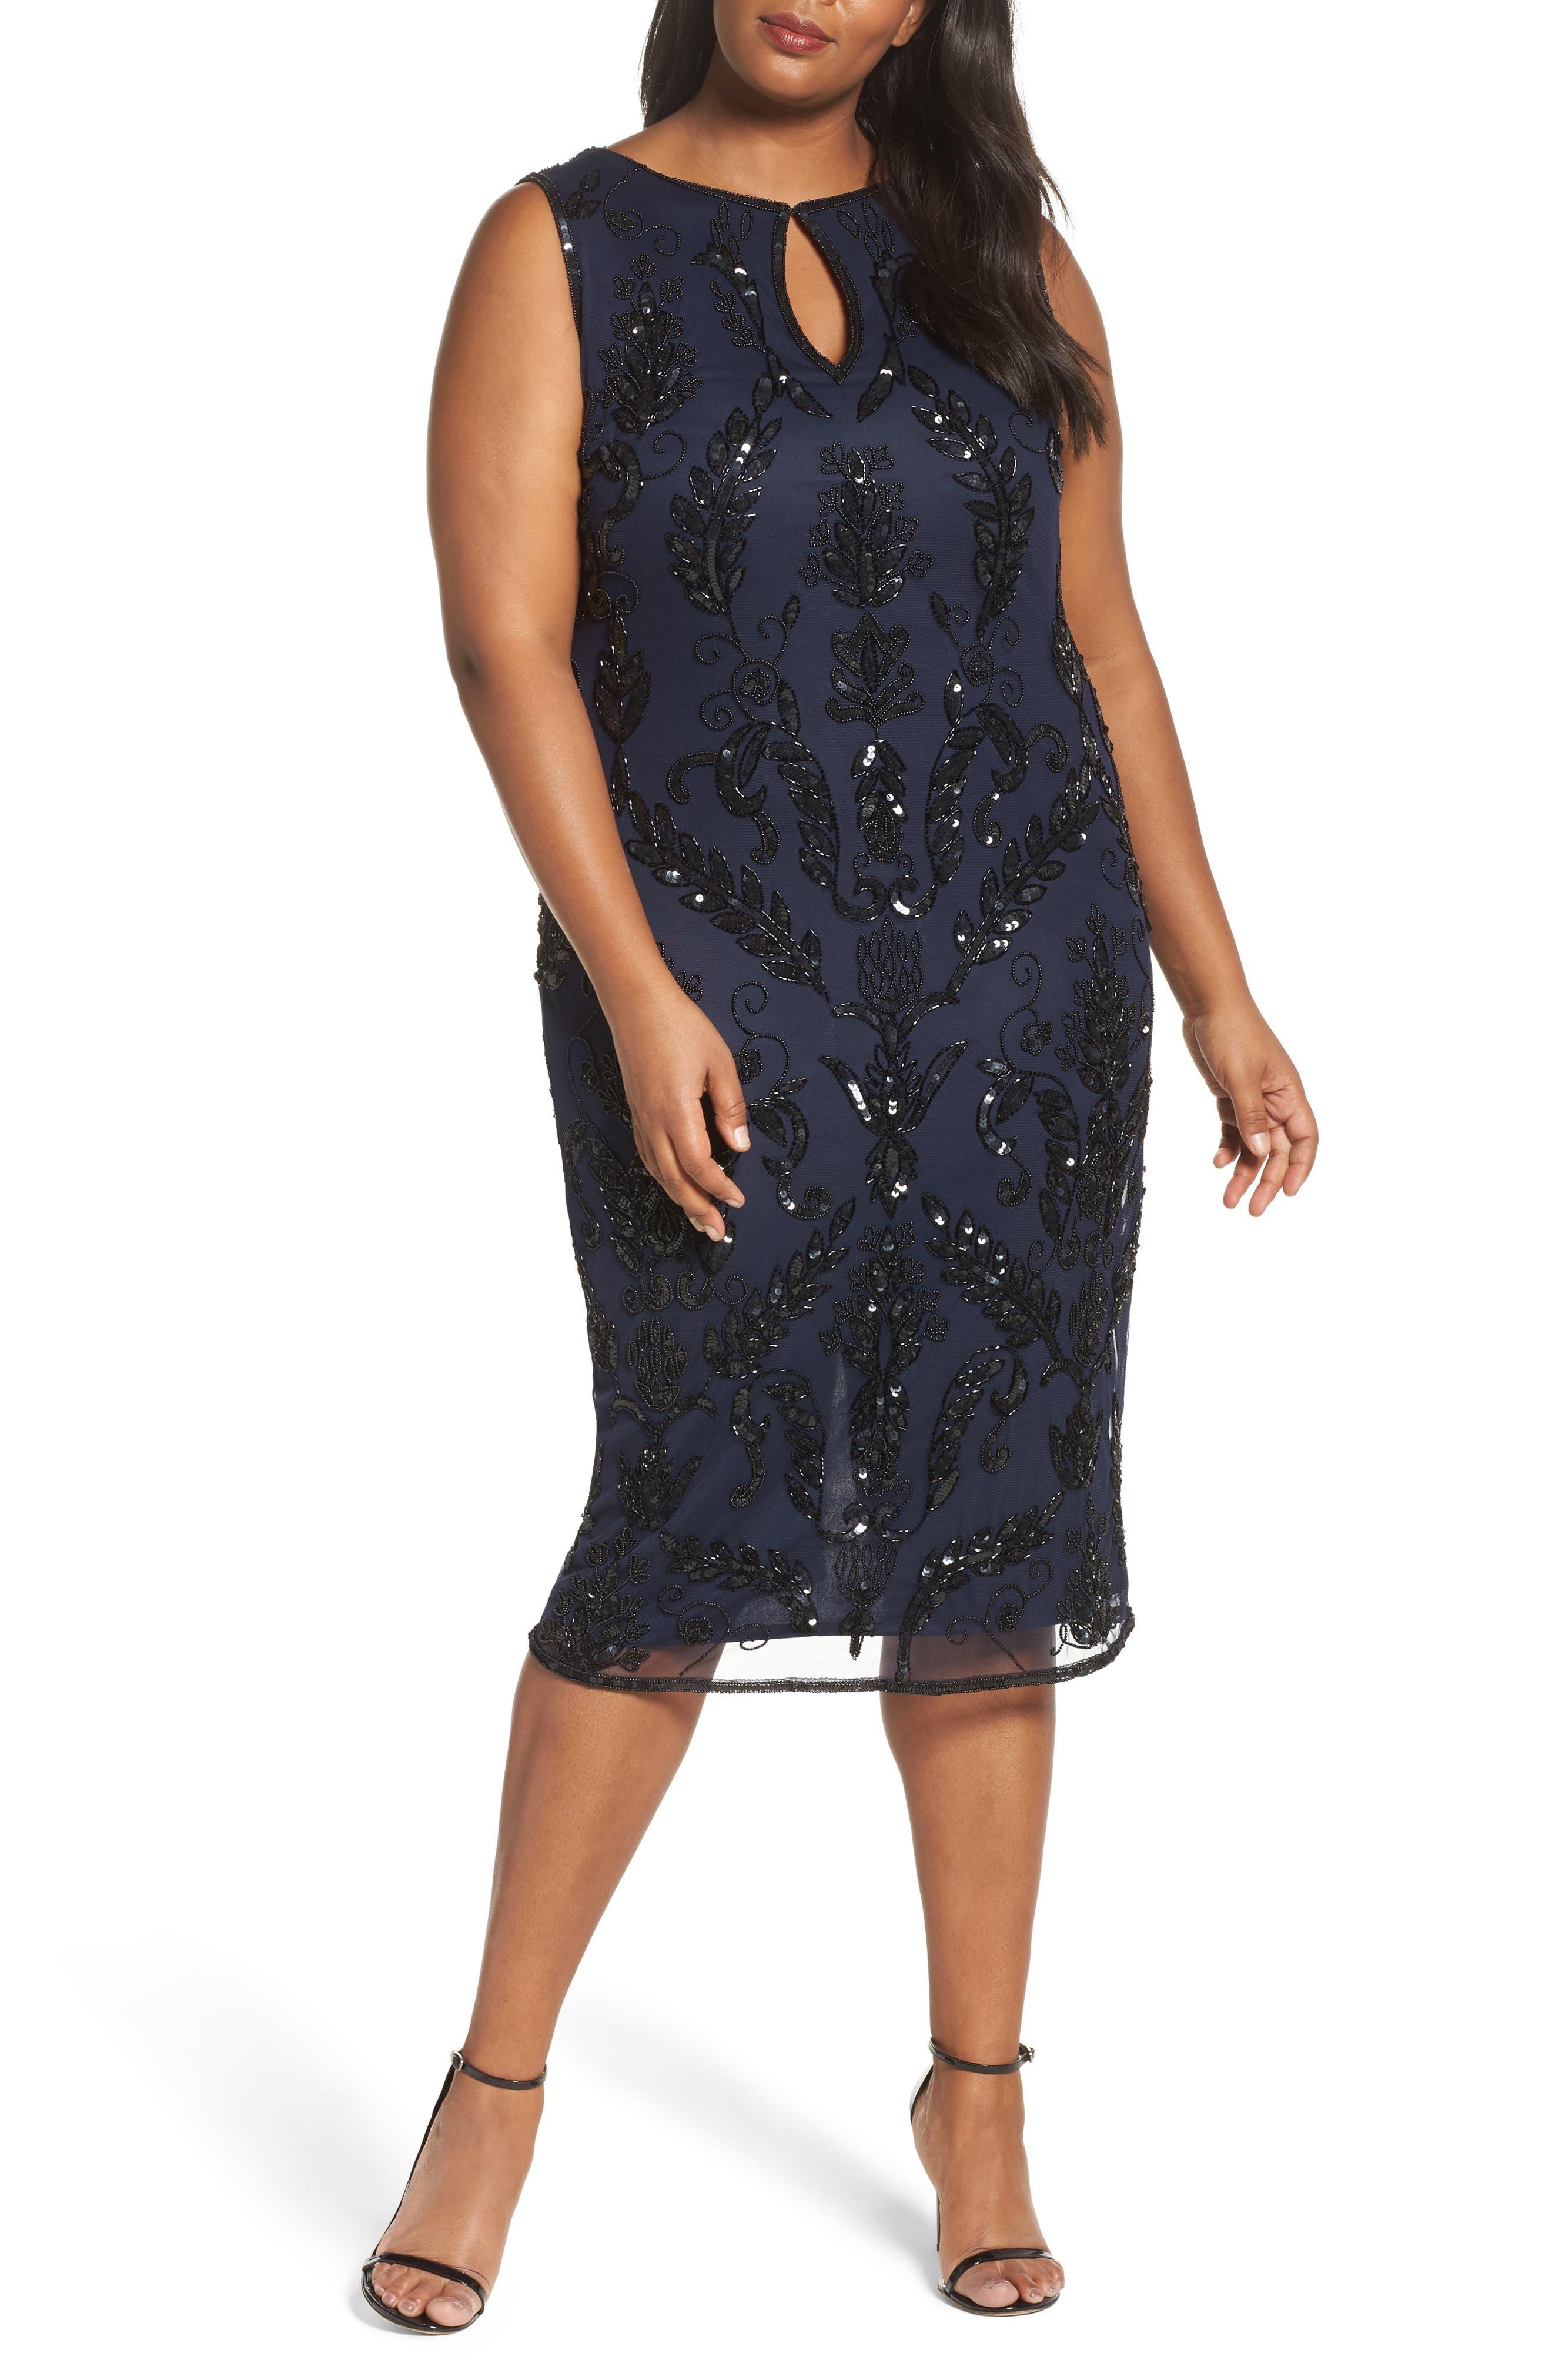 Alternate Image 1 Selected - Pisarro Nights Embellished Tea Length Sheath Dress (Plus Size)